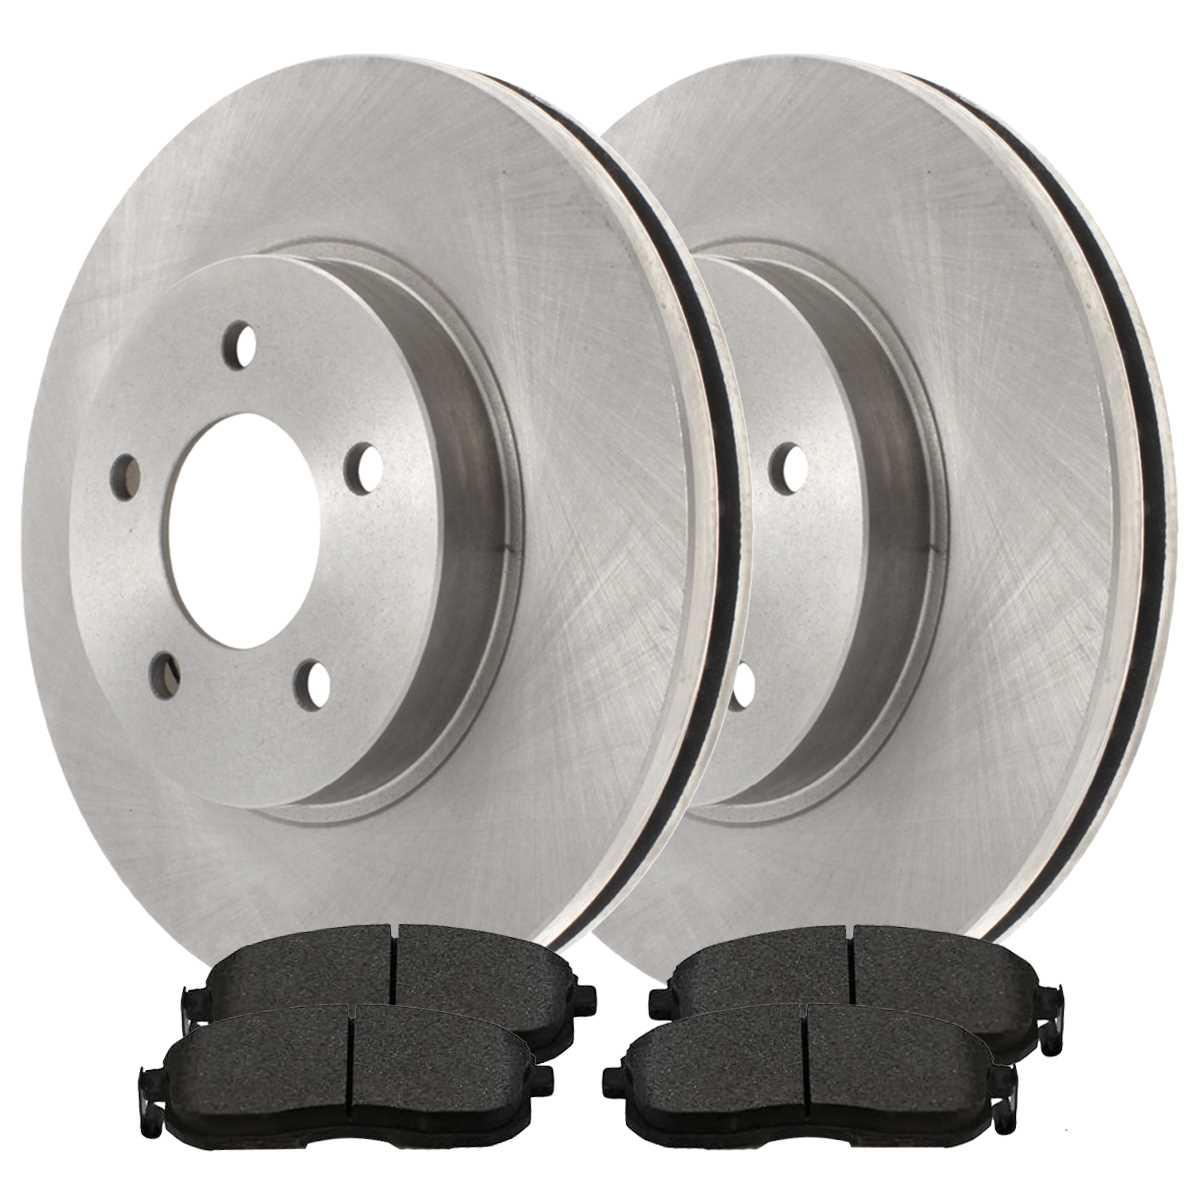 AutoShack RSMK63053-63053-1273-2-4 Front Brake Rotors and Semi Metallic Pads